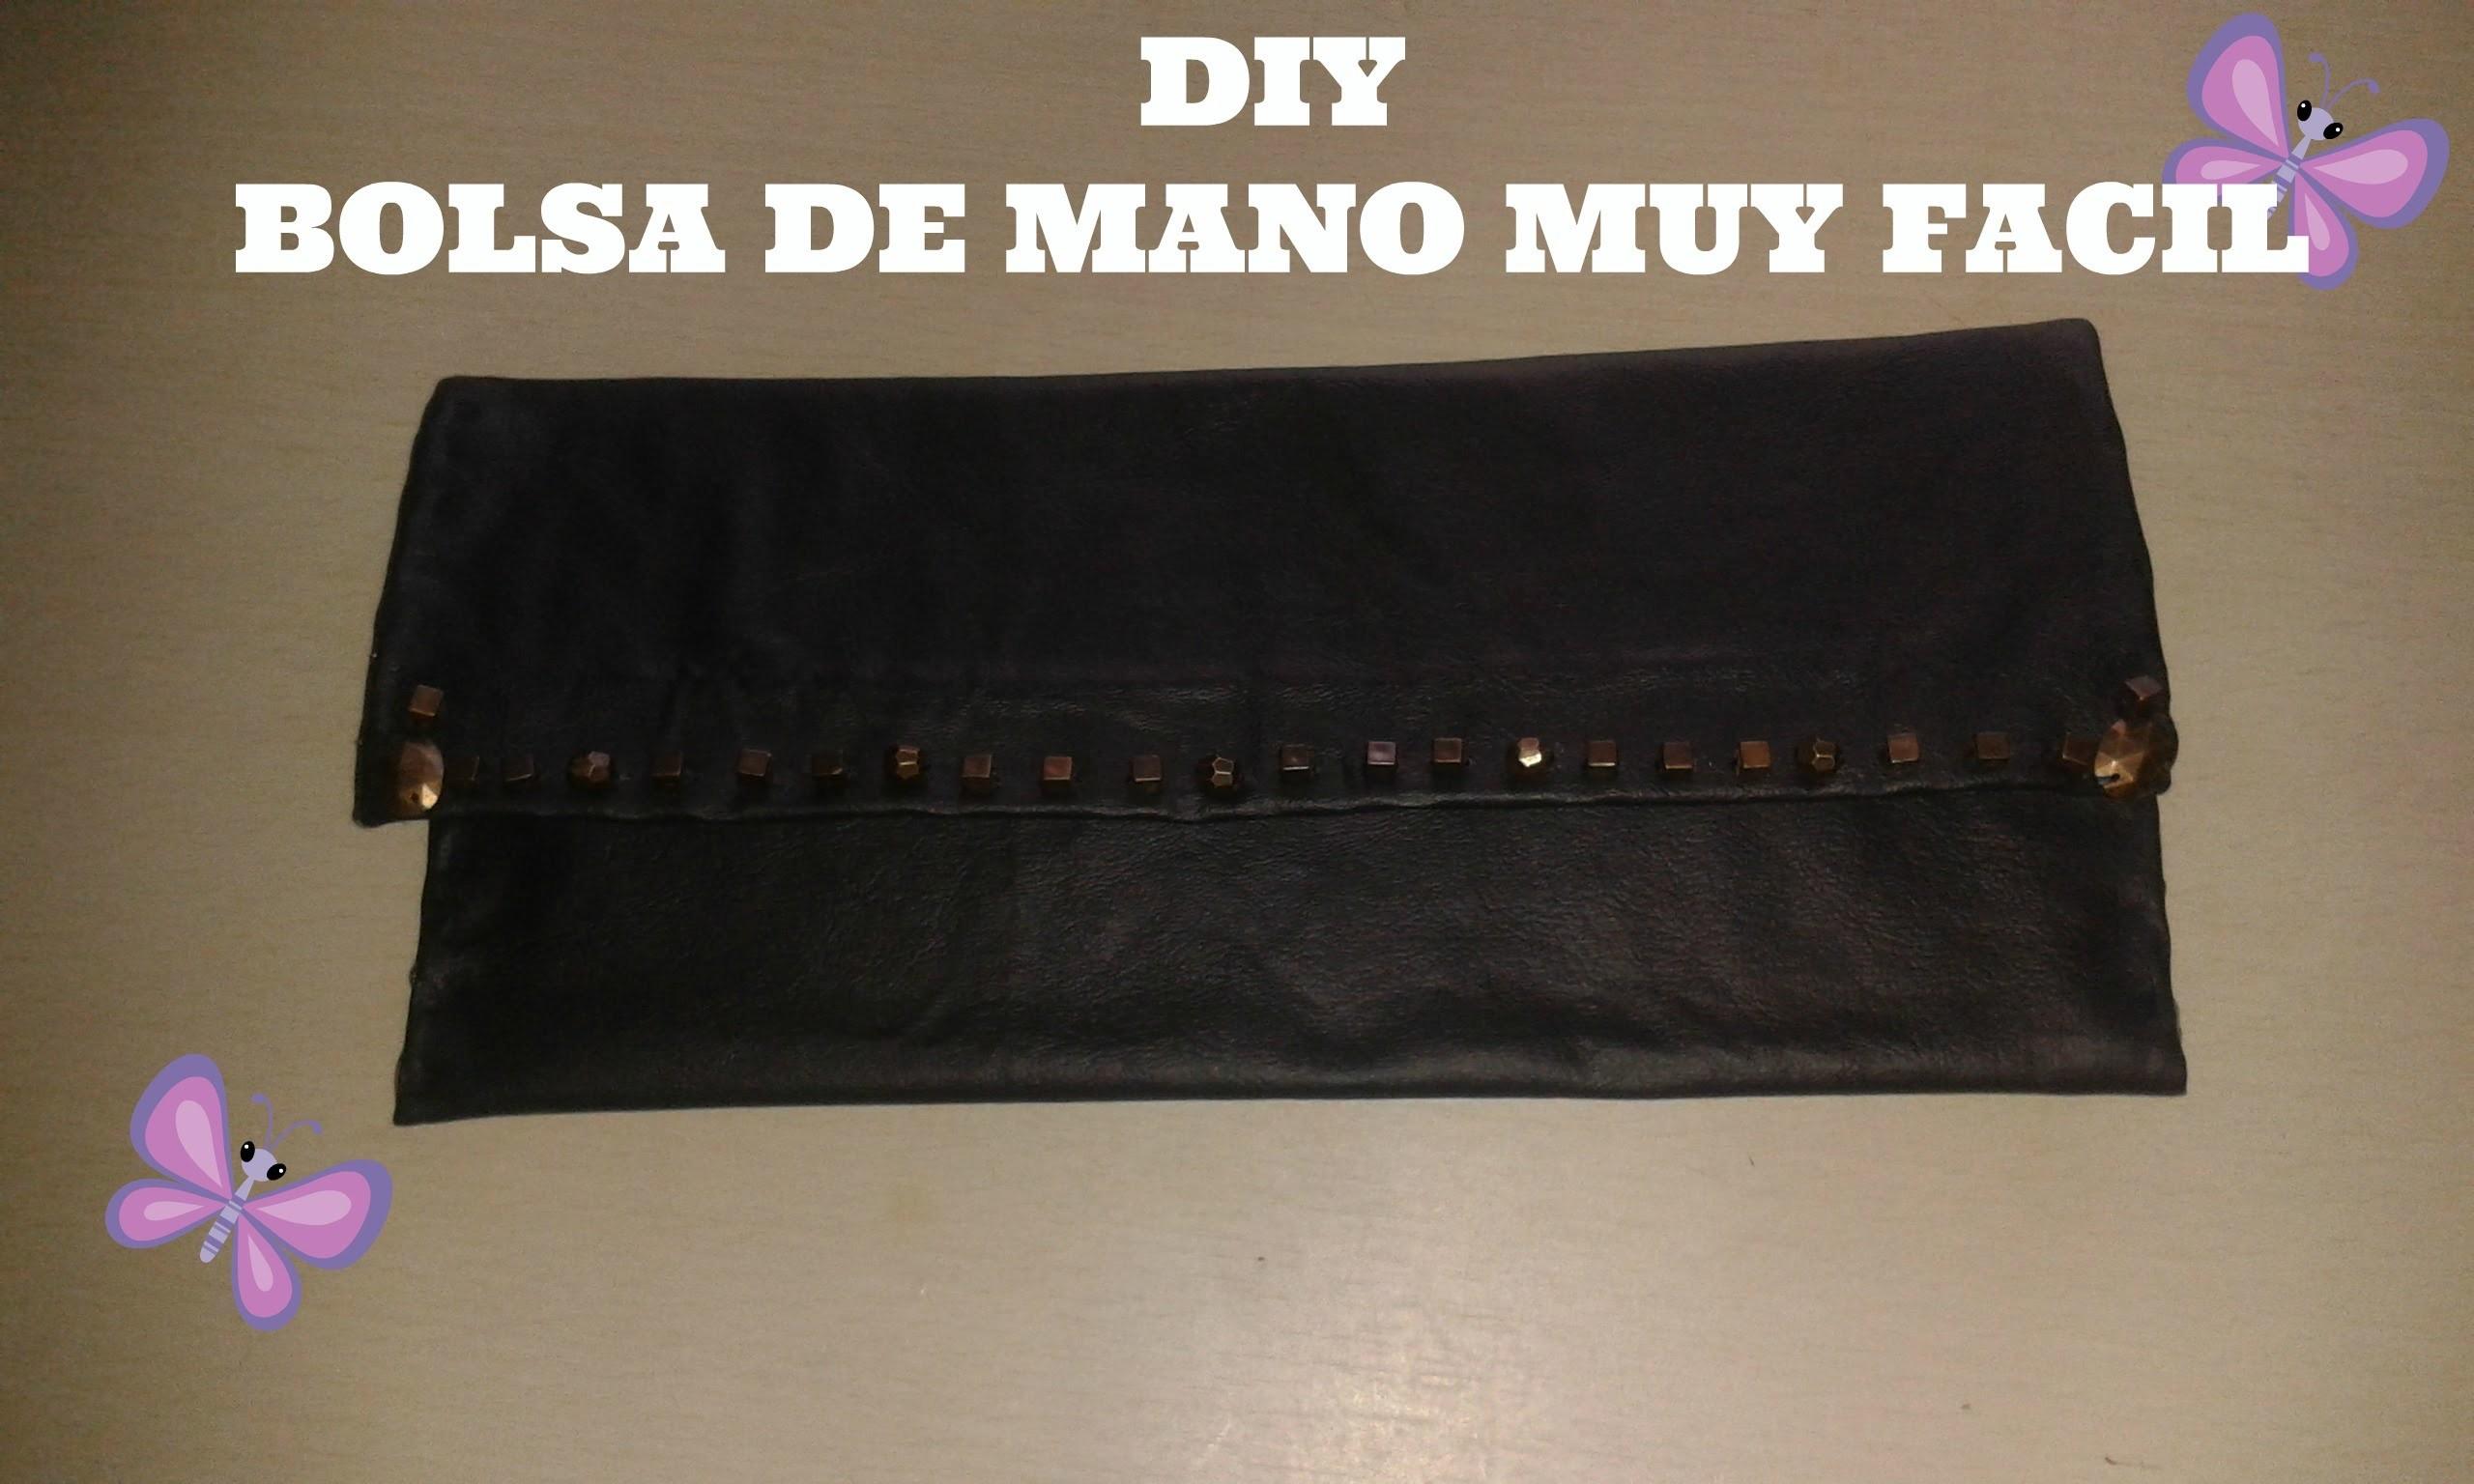 DIY BOLSA DE MANO MUY FACIL